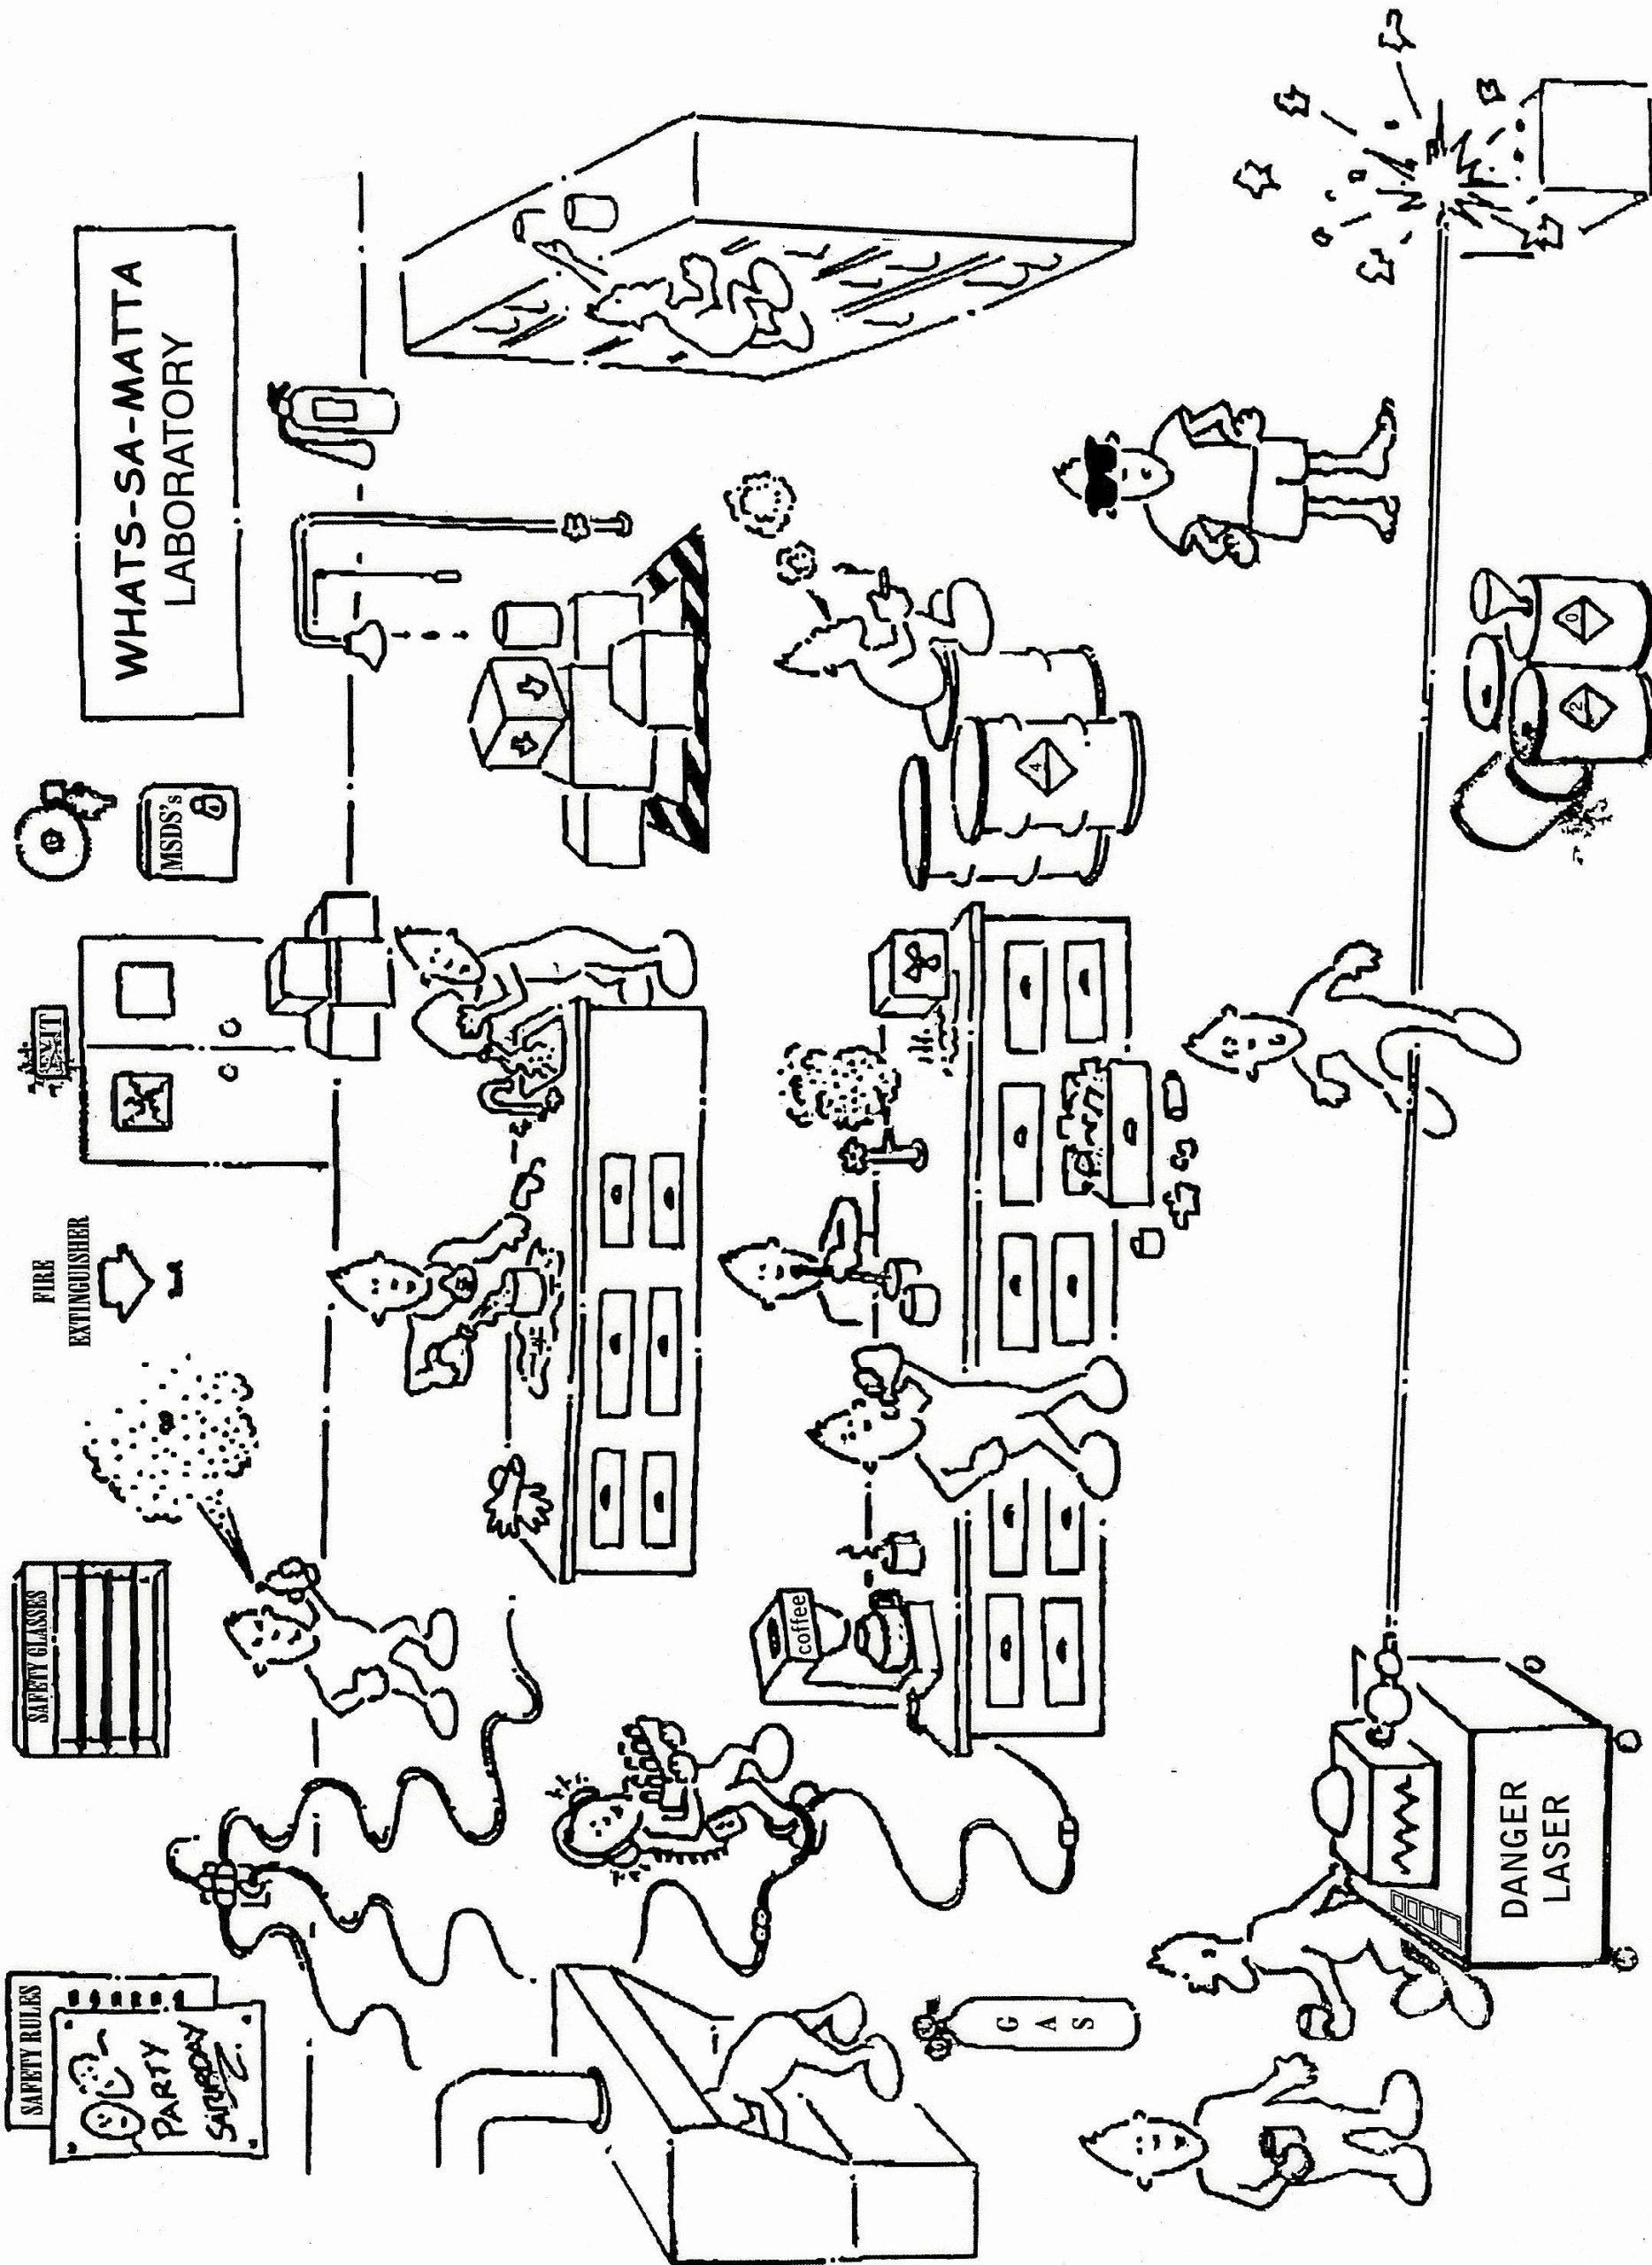 Chemistry Of Life Worksheet 50 Lab Safety Symbols Worksheet In 2020 with Images